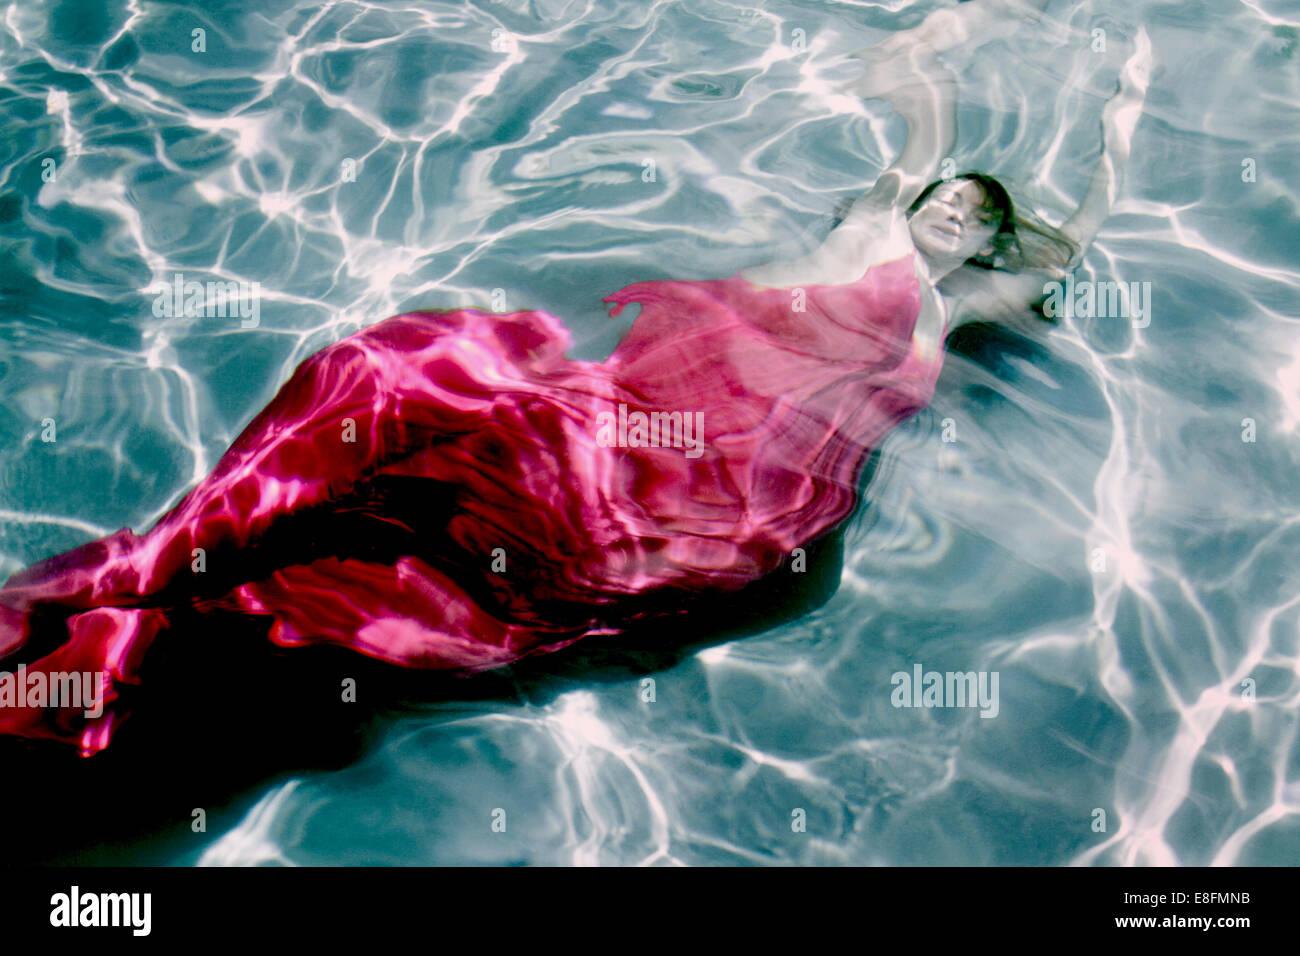 Woman in dress underwater Photo Stock